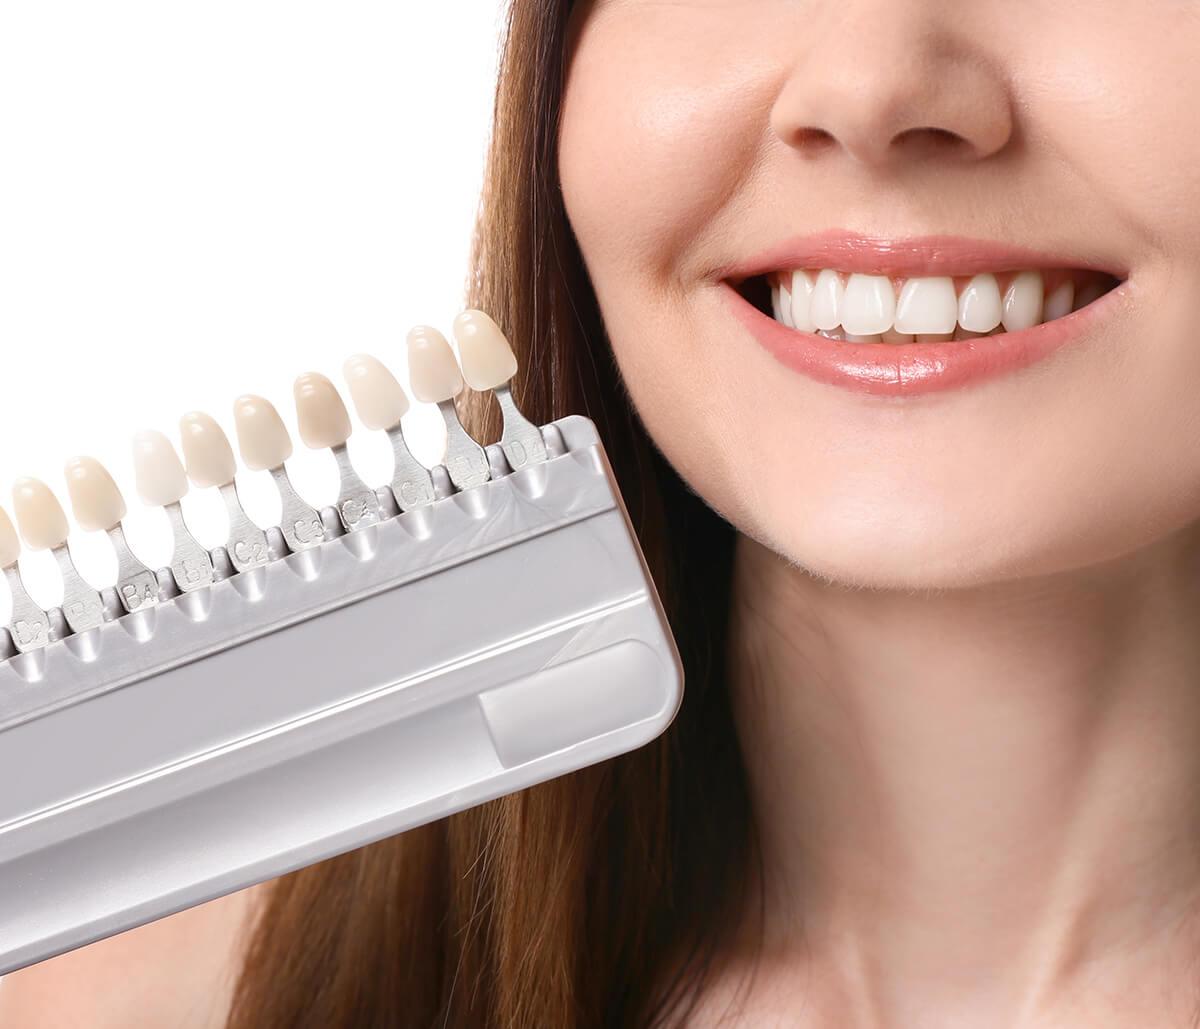 Veneers for Crooked Teeth at Dental Health & Aesthetics Center in Aliso Viejo CA Area